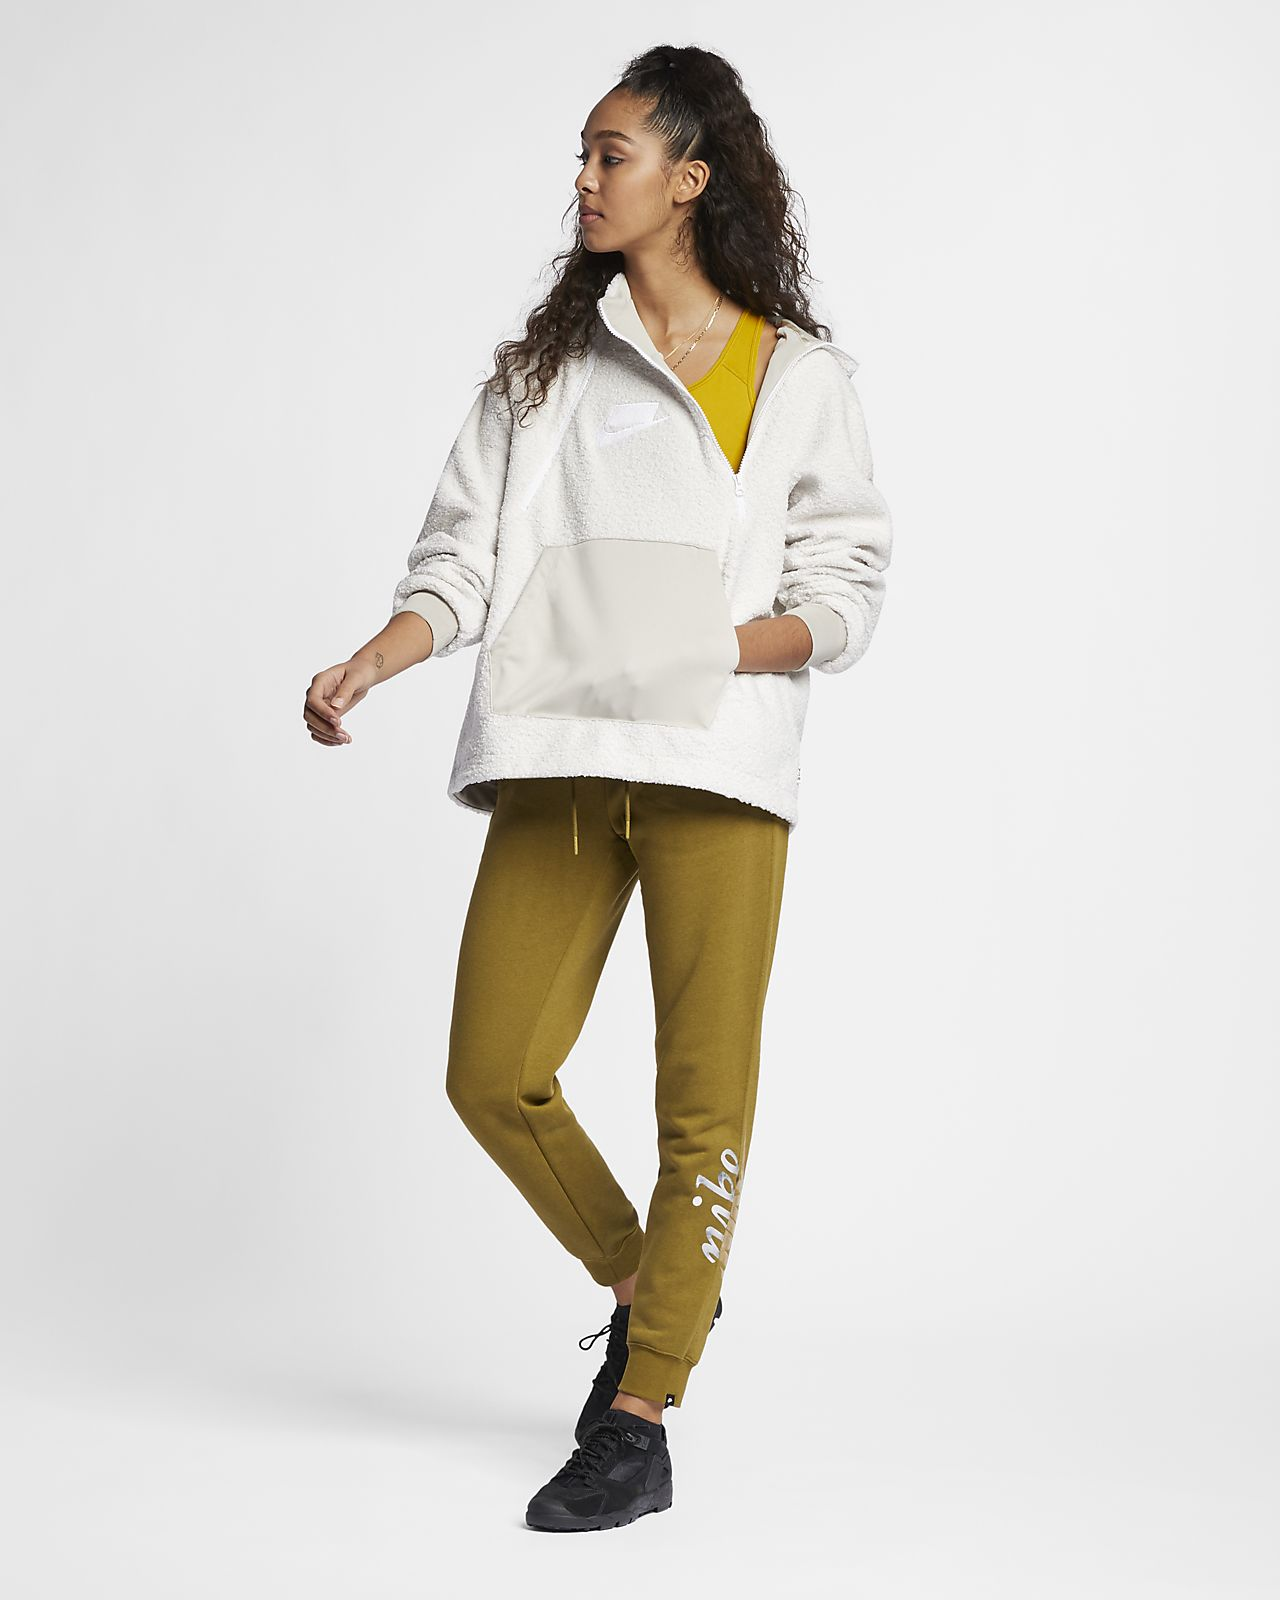 ... Sudadera con capucha sin cierre de tejido Sherpa para mujer Nike  Sportswear NSW a44e5acad2e8